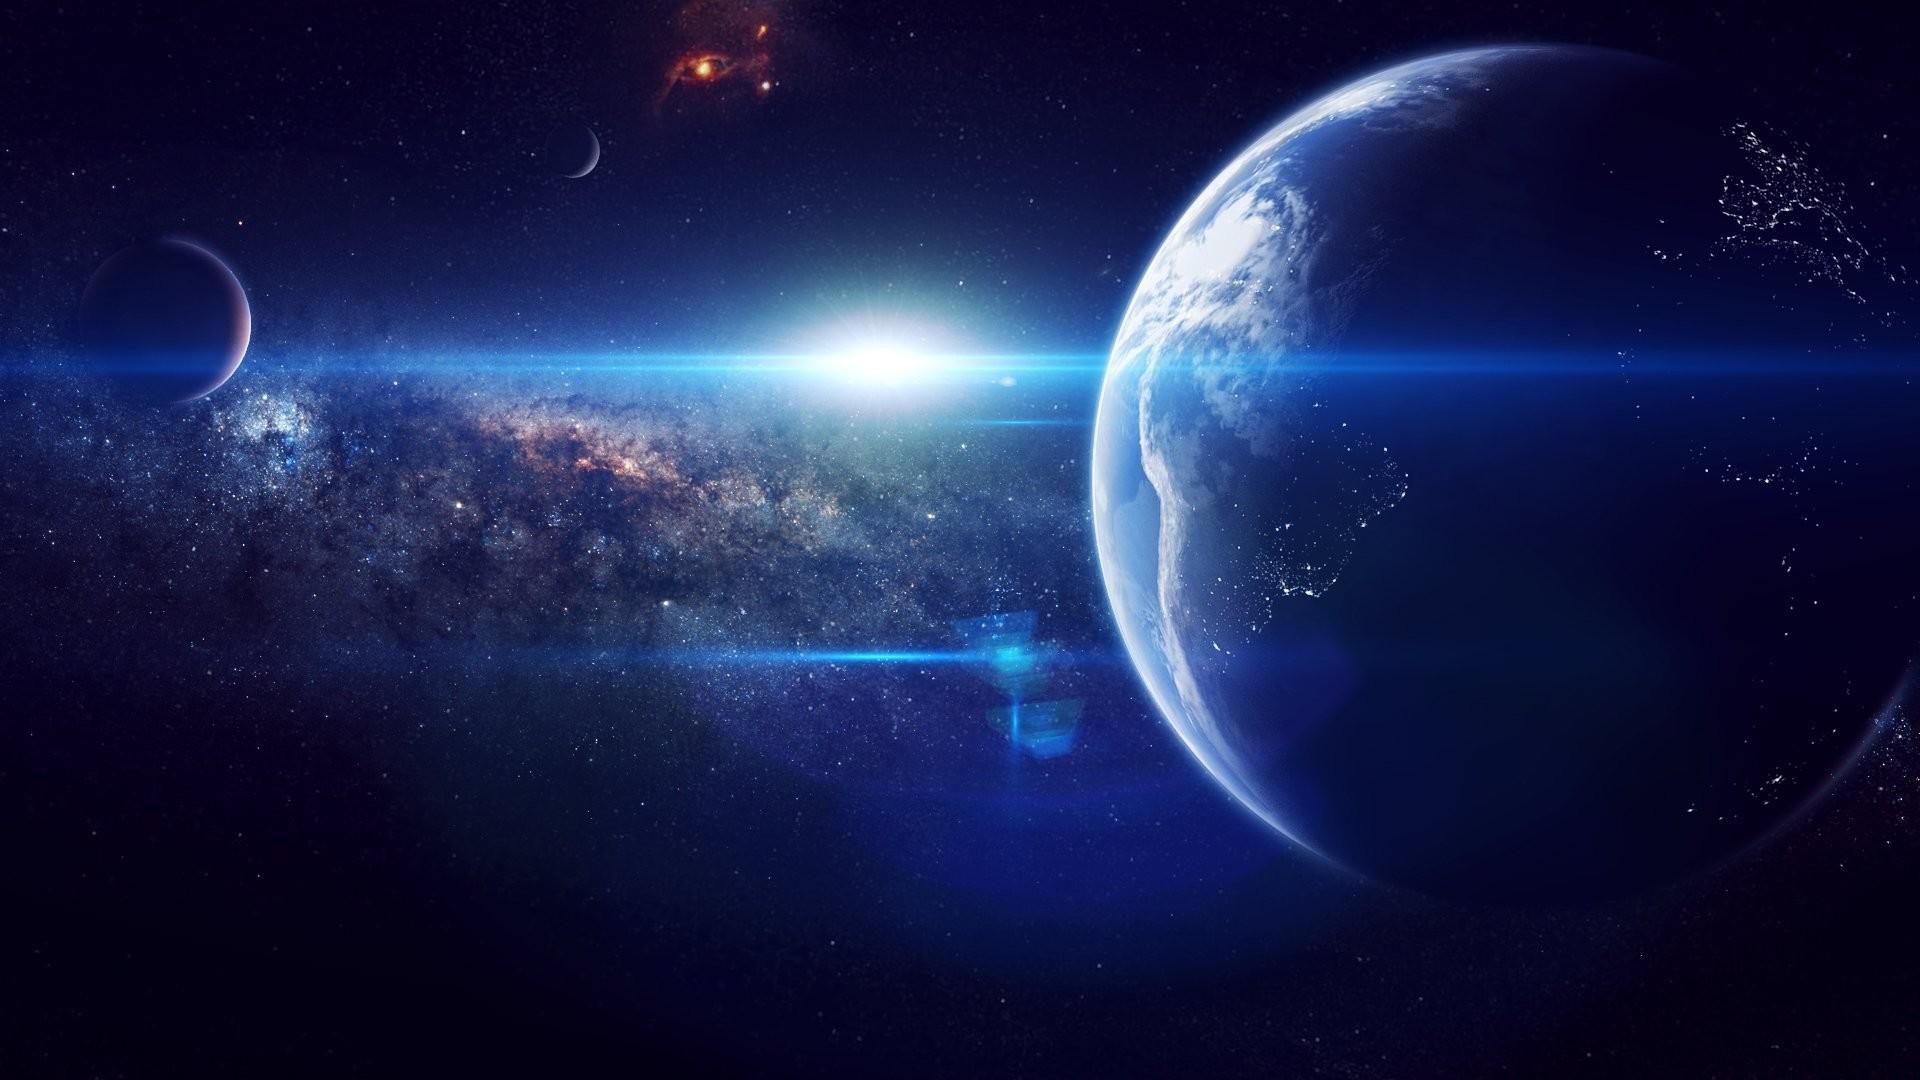 planet land star space earth art universe nebula space HD wallpaper